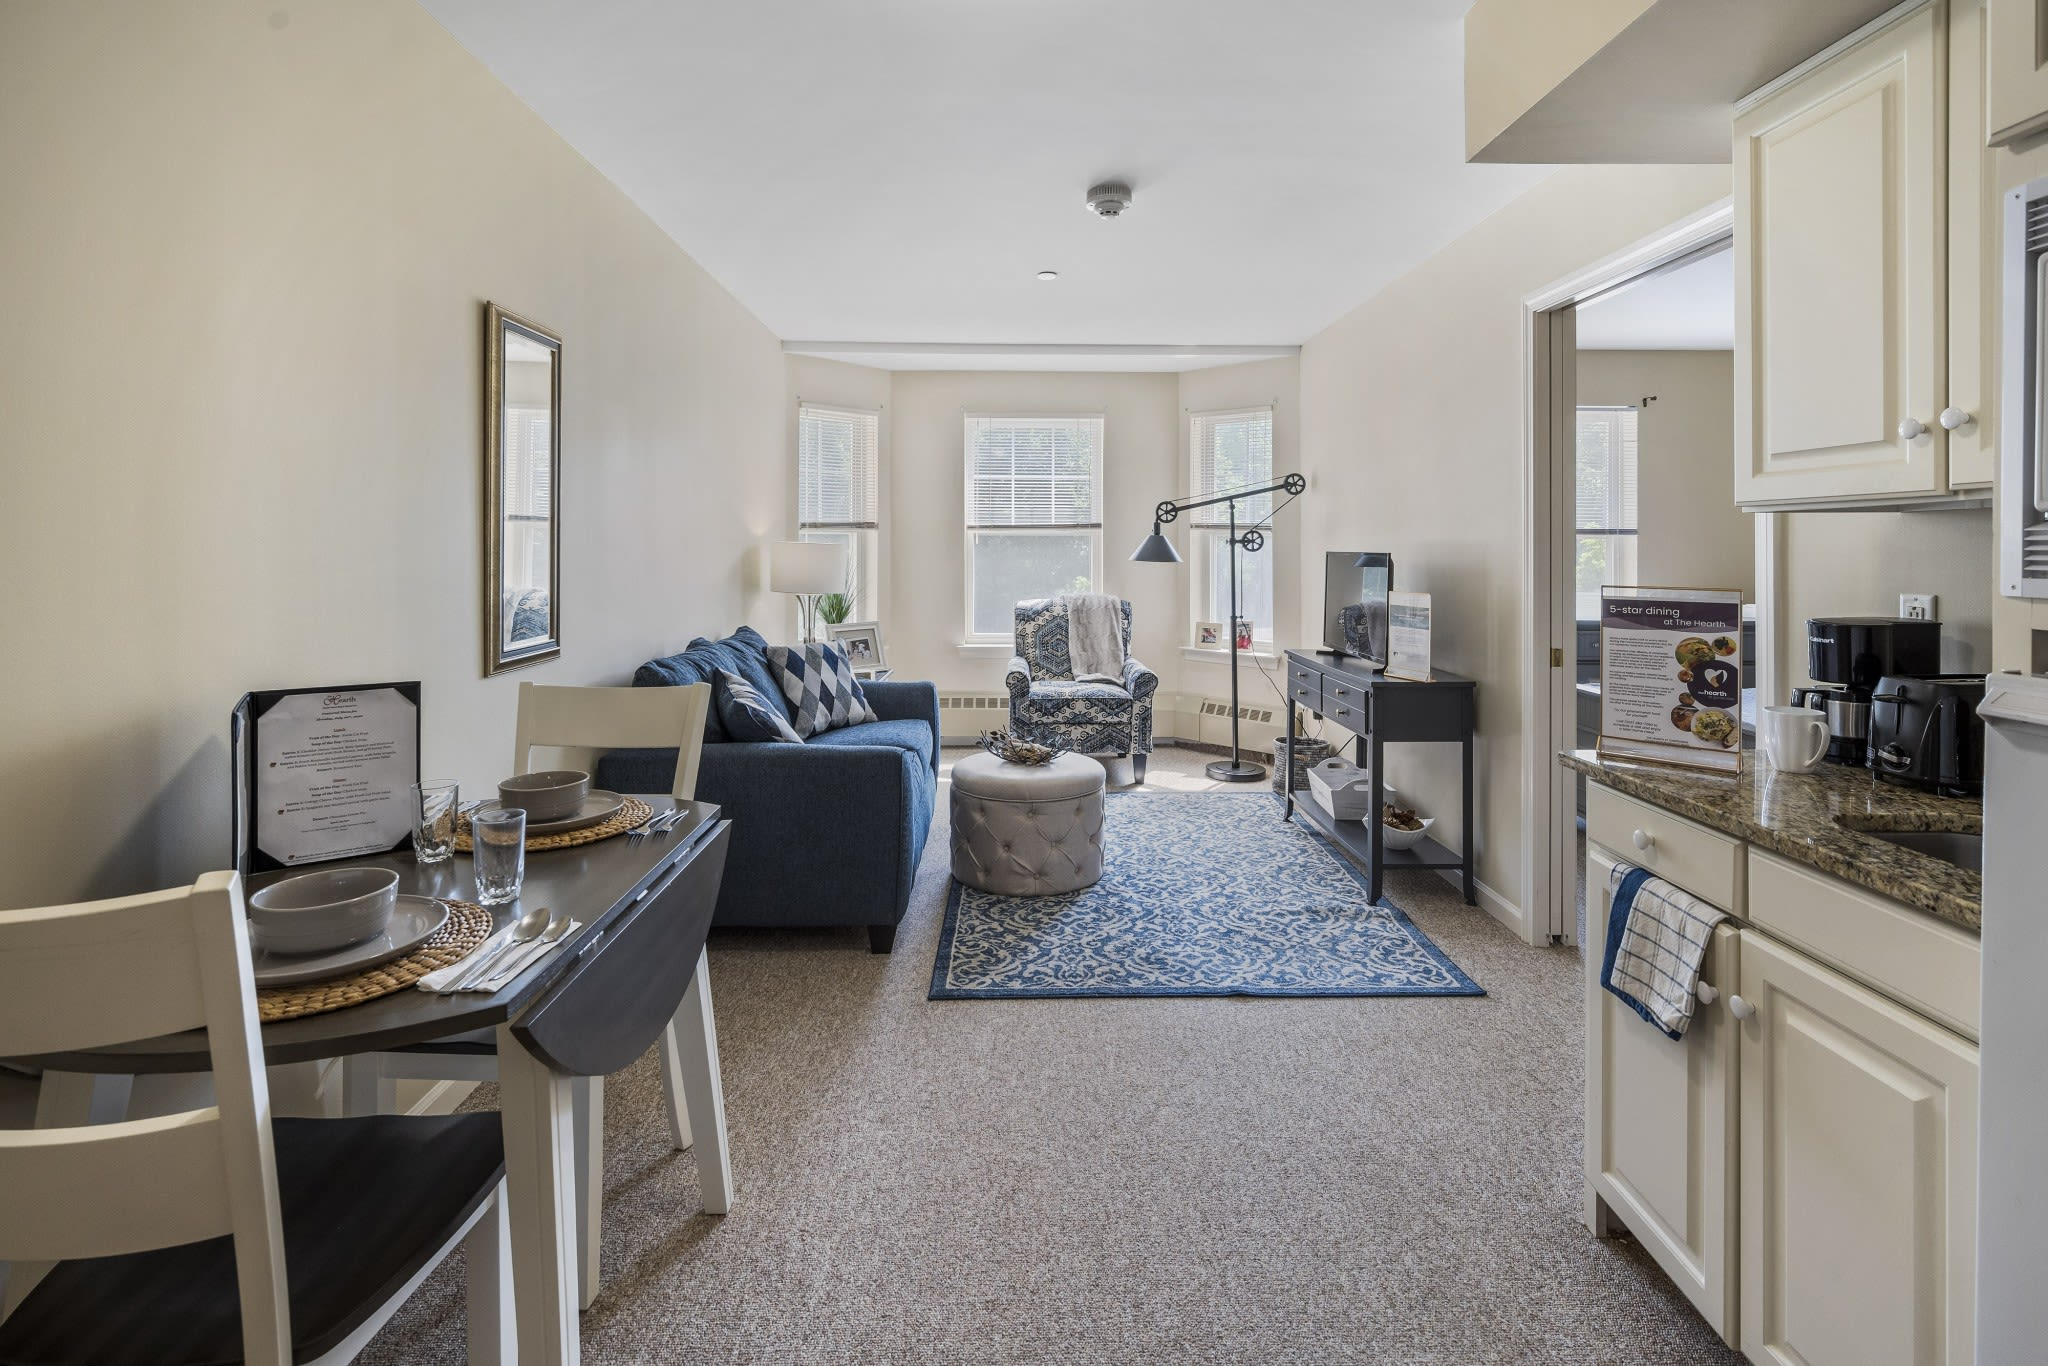 Senior apartment The Hearth at Gardenside in Branford, Connecticut